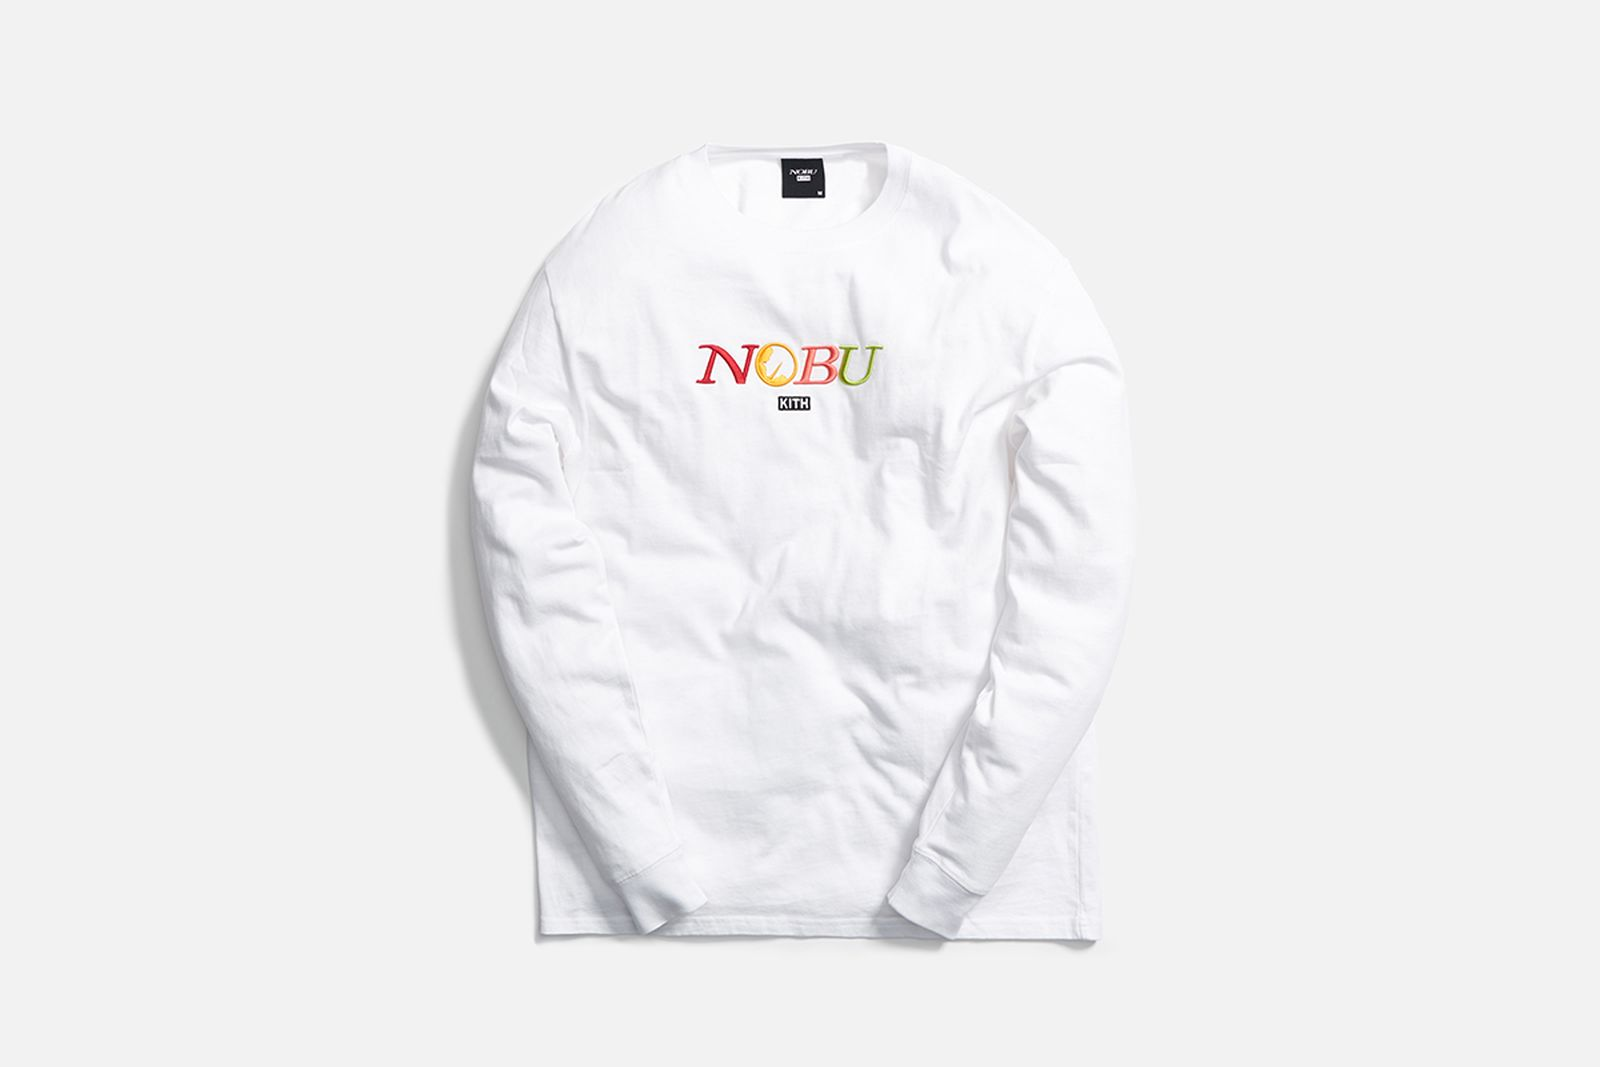 kith nobu collection ronnie fieg